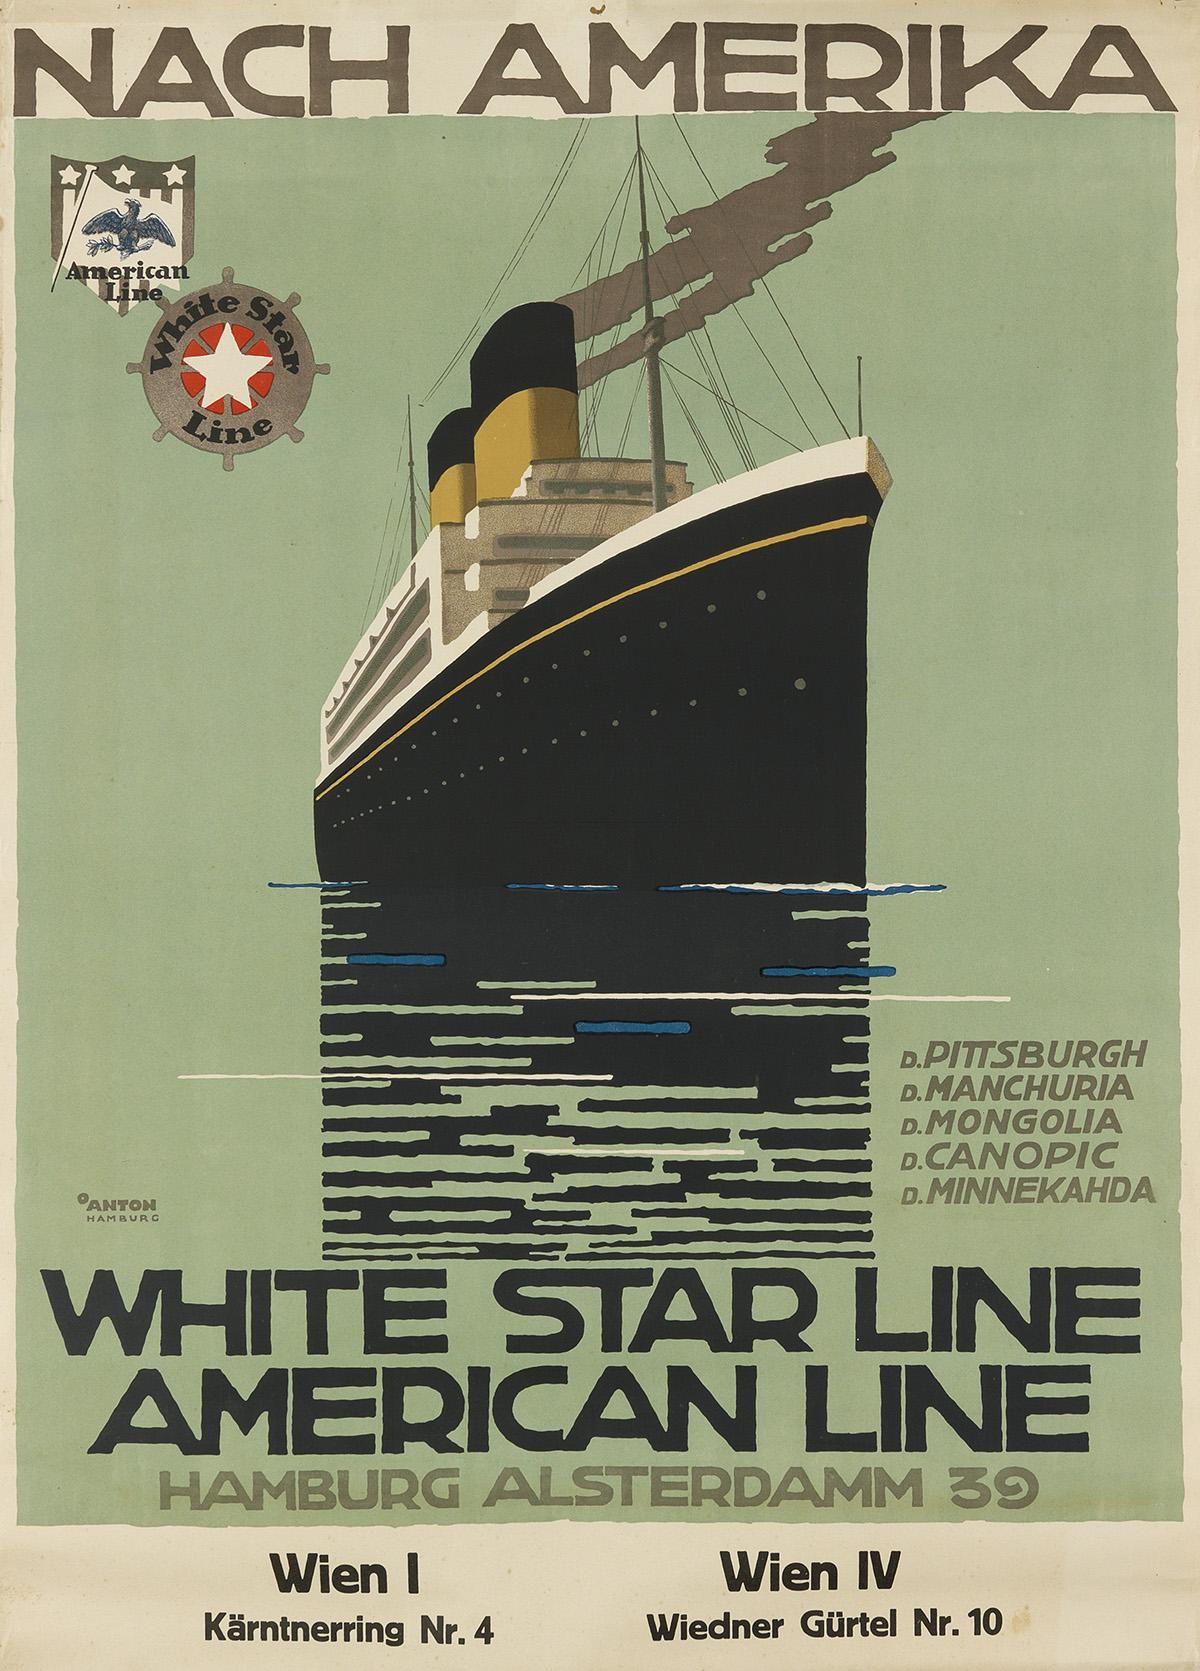 OTTOMAR-ANTON-(1895-1976)-NACH-AMERIKA--WHITE-STAR-LINE--AME